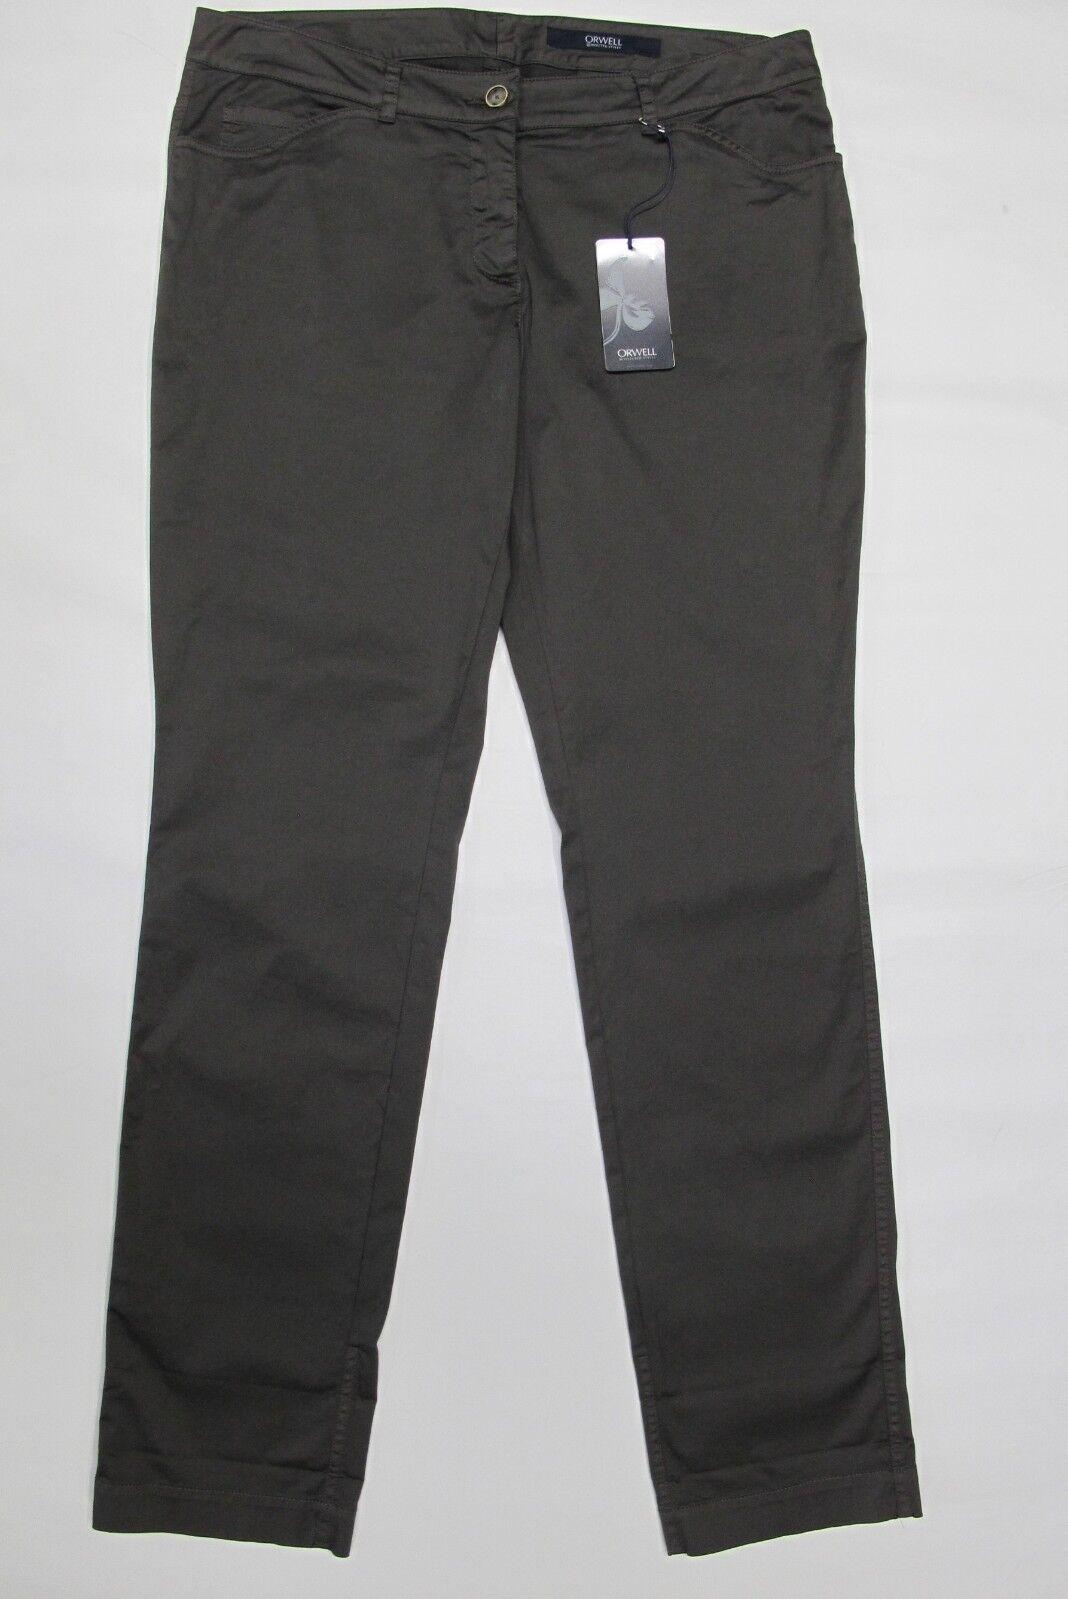 Orwell pants Amada, Größe 44, Colour braun,